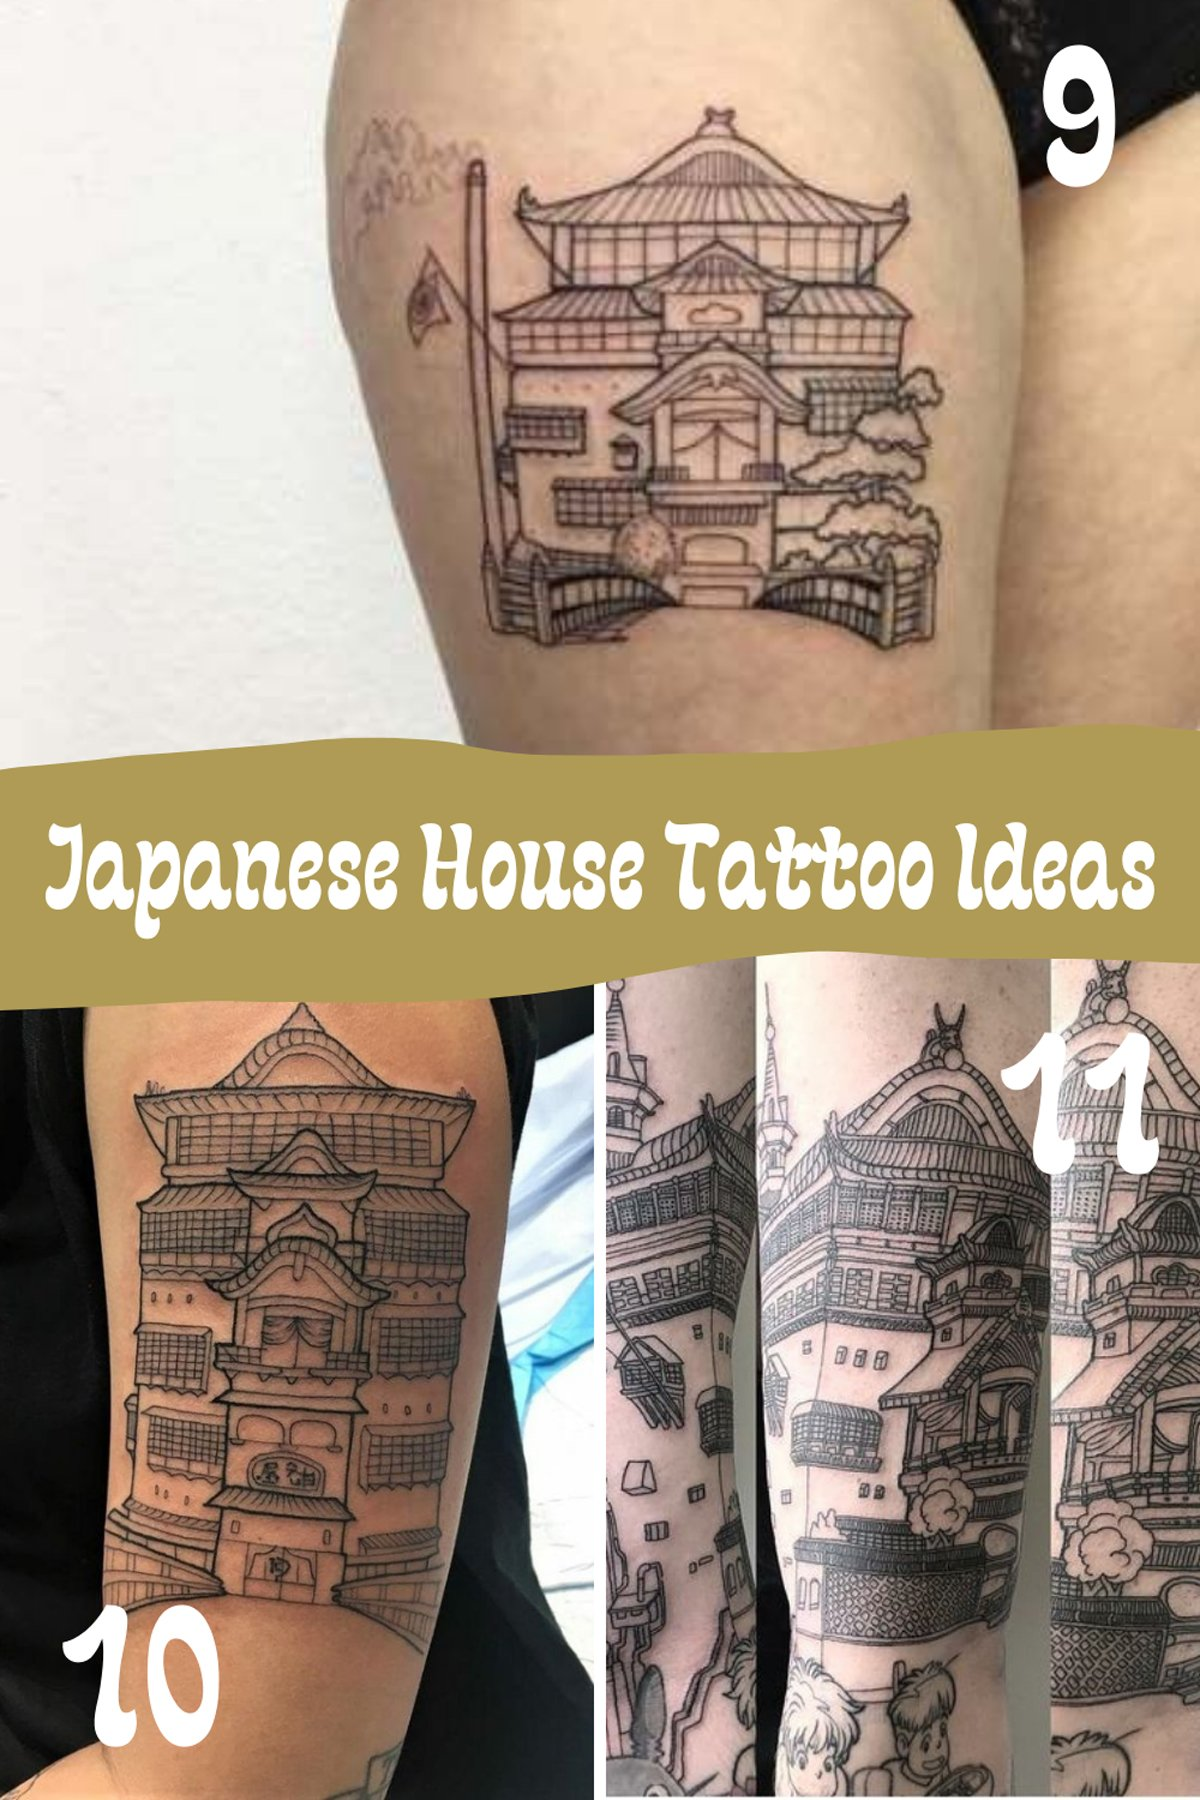 Japanese House Tattoo Ideas